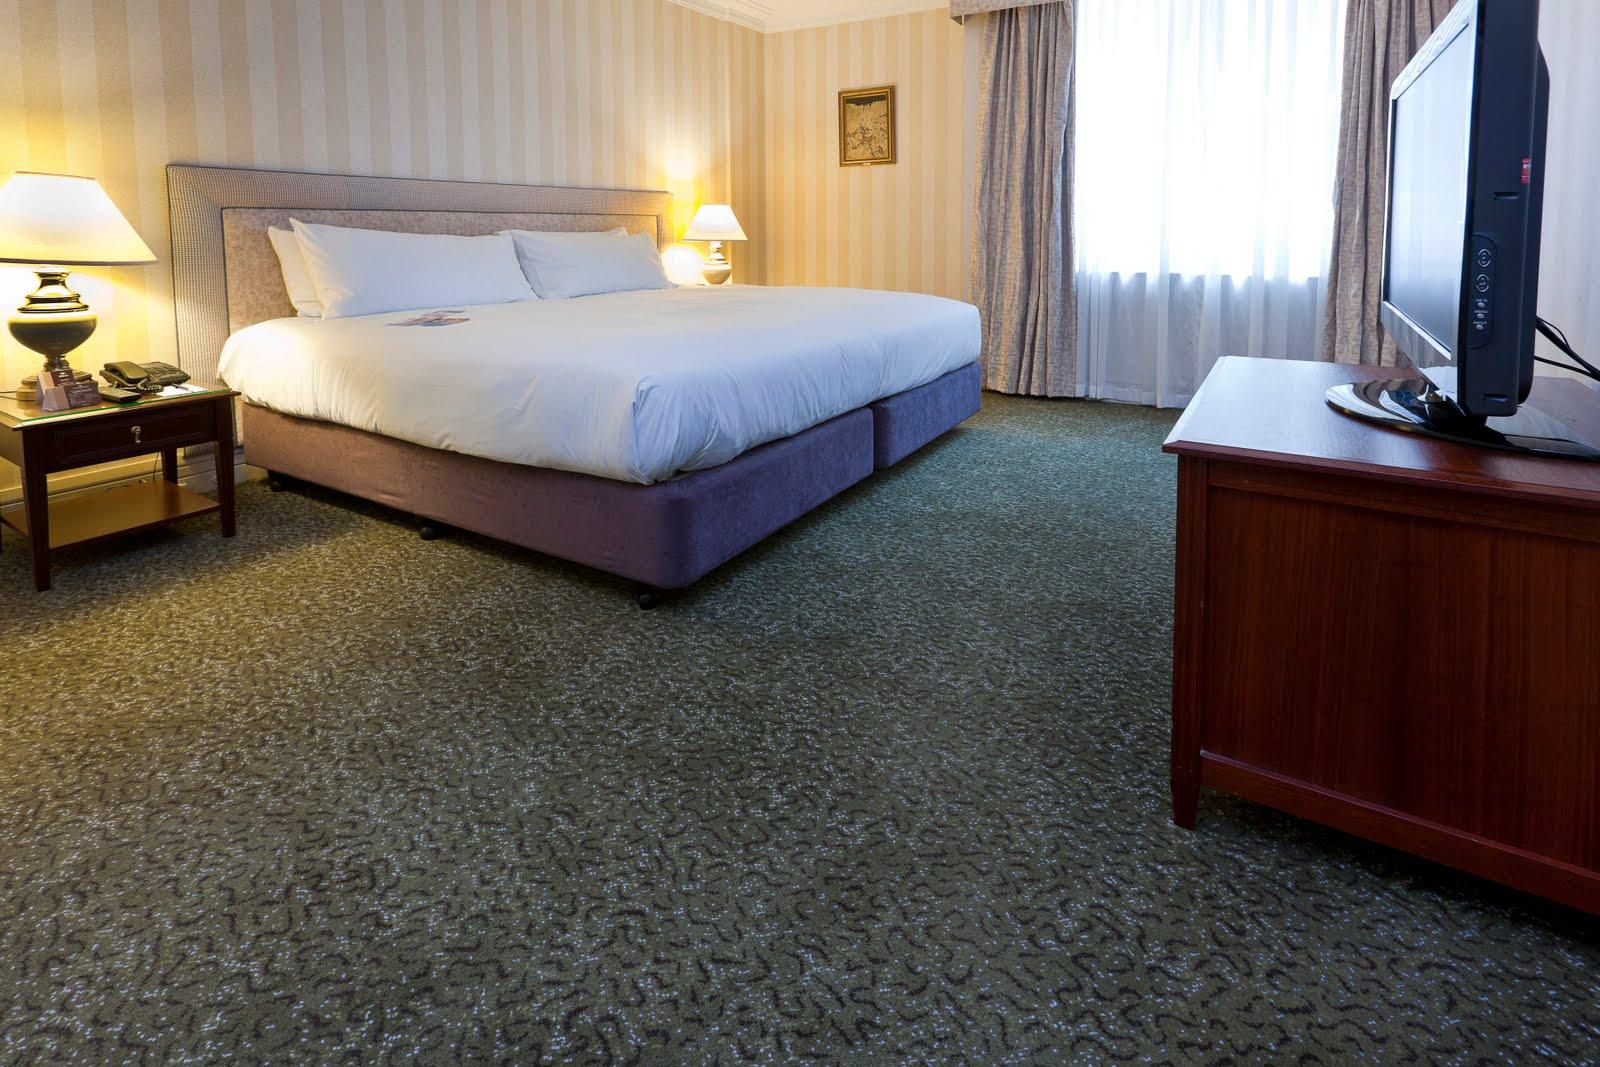 Rubber floor mats perth - Floorwise Project Parmelia Hilton Hotel Perth